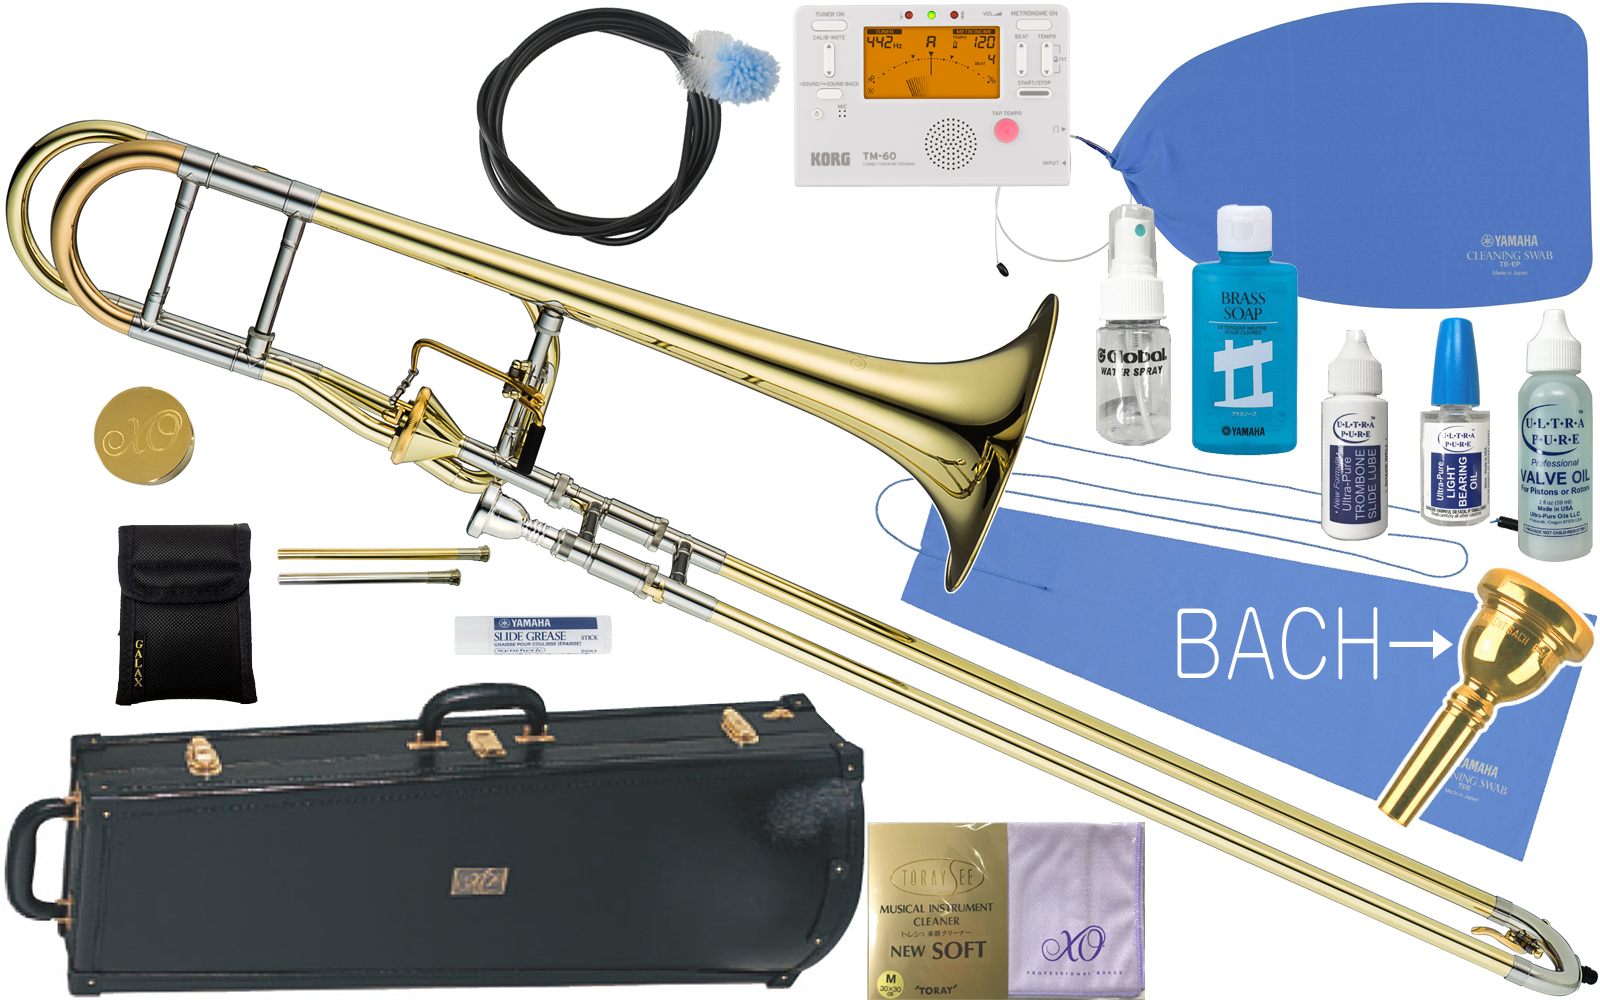 XO ( エックスオー ) 1236L-T トロンボーン 新品 B♭/F管 テナーバストロンボーン アキシャルフローバルブ イエローブラス 太管 Tenor Bass Trombones BT-L セットA 送料無料